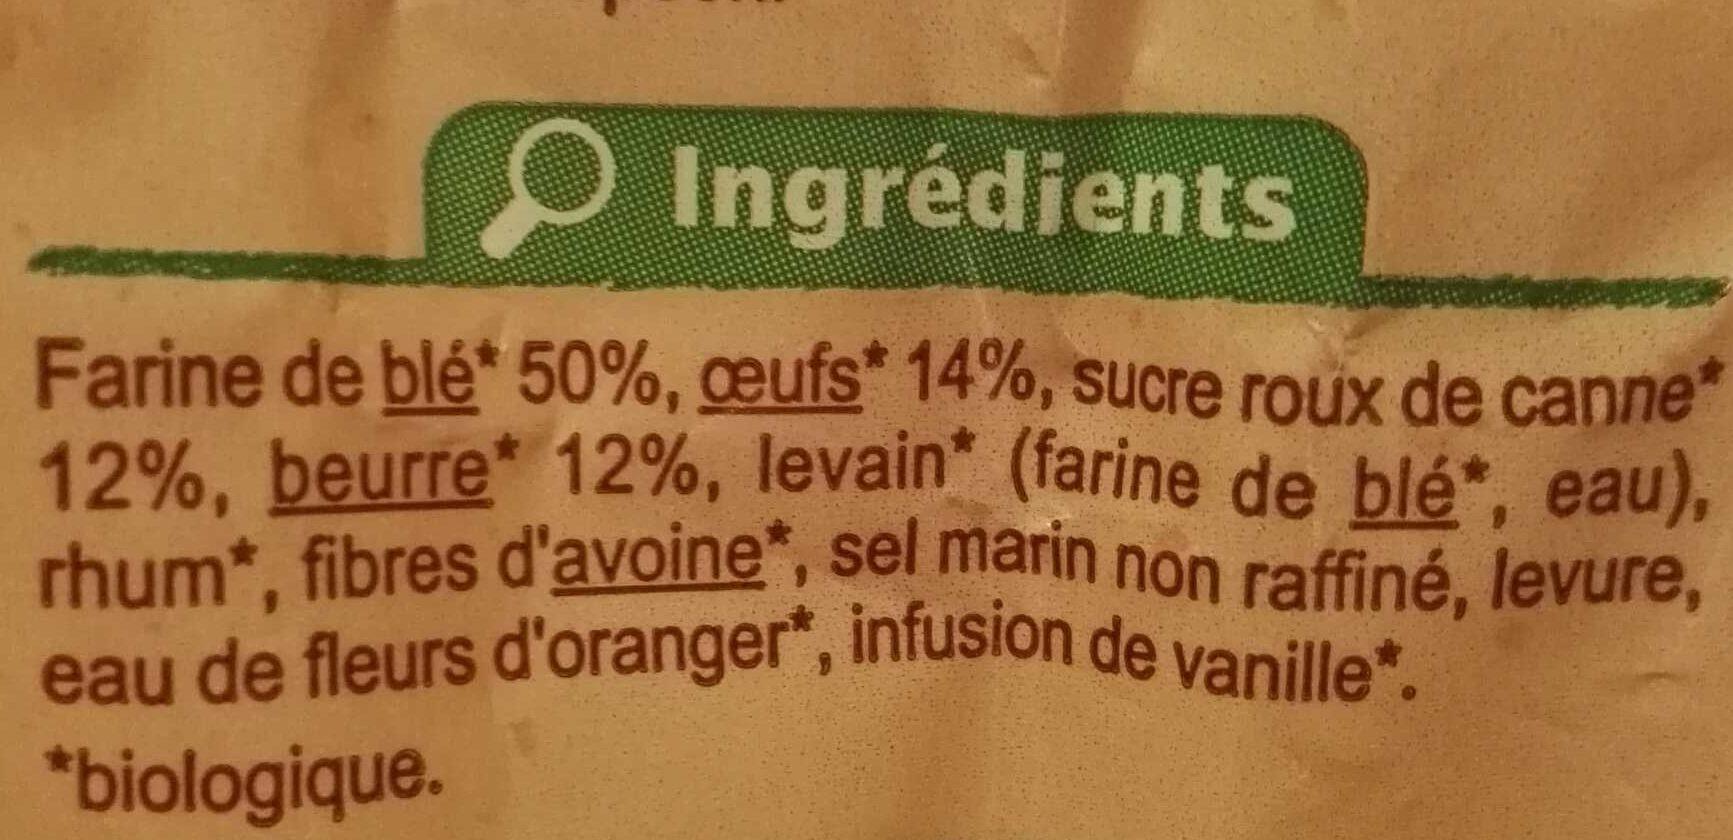 Brioche Tranchée Pur Beurre - Ingredients